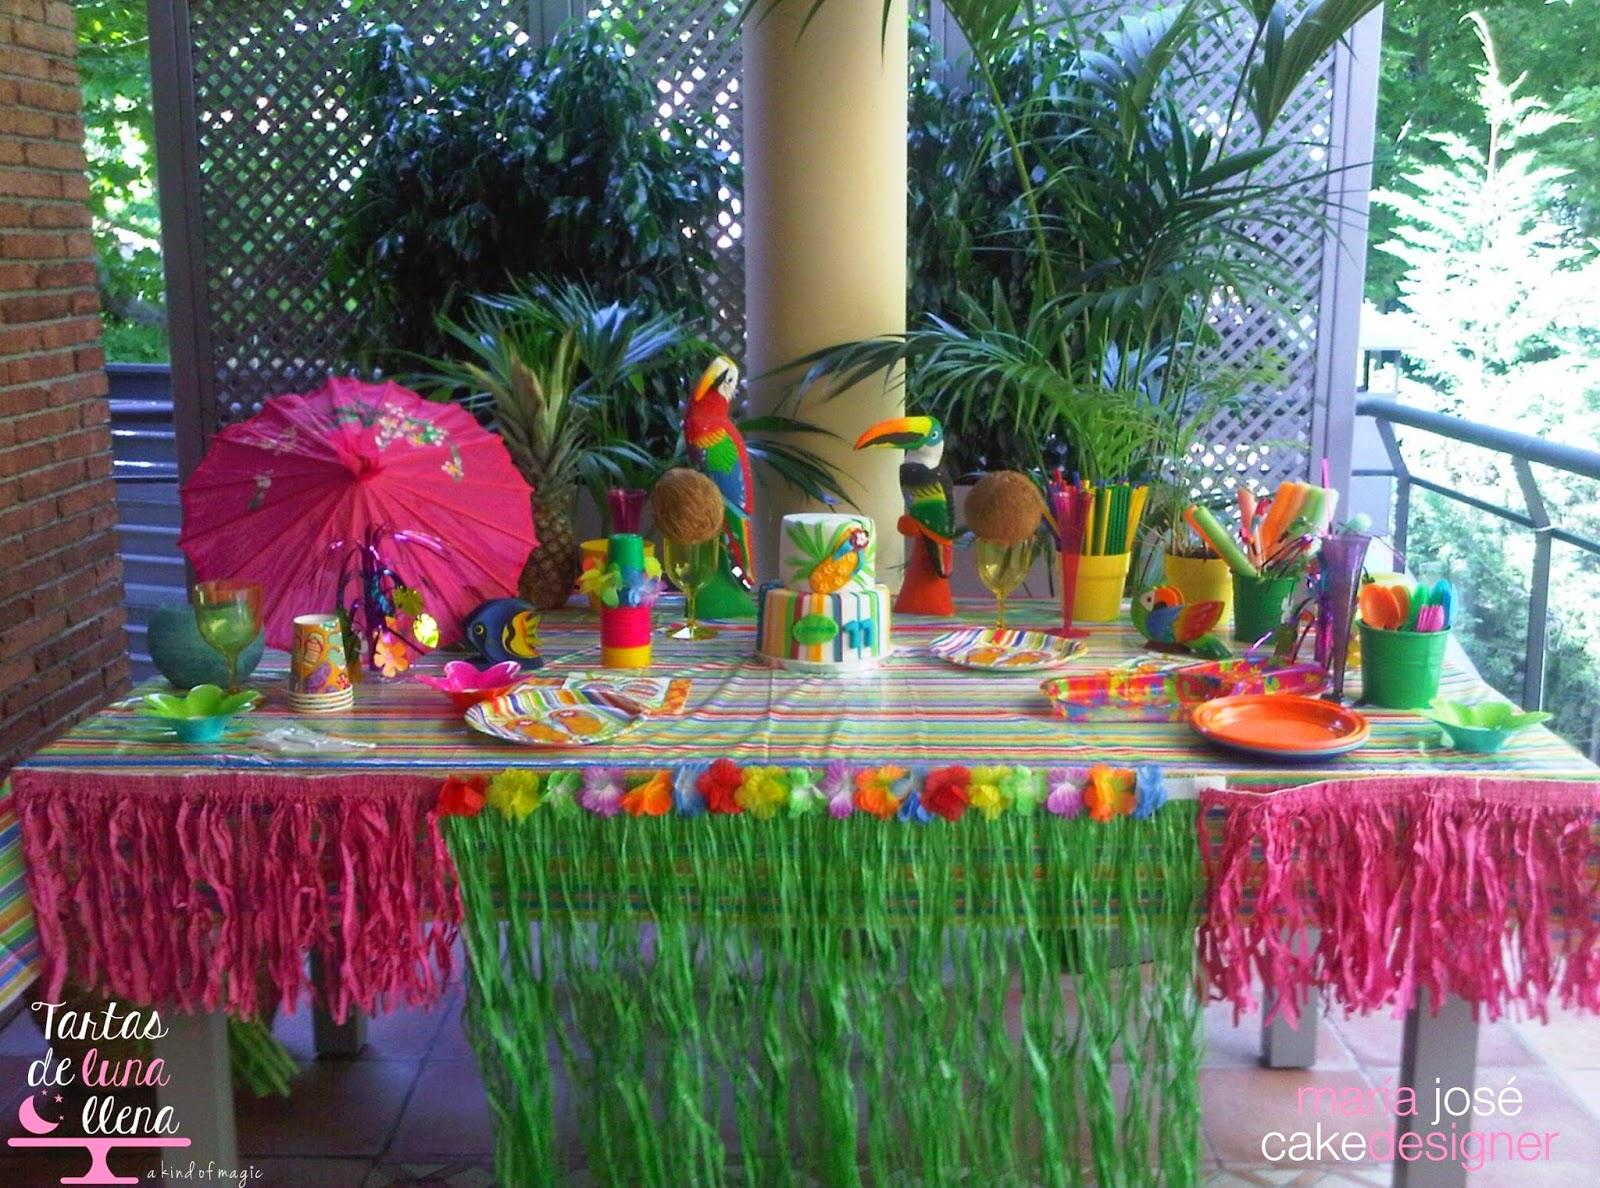 Decoracion hawaiana para imprimir - Fiesta hawaiana ideas decoracion ...